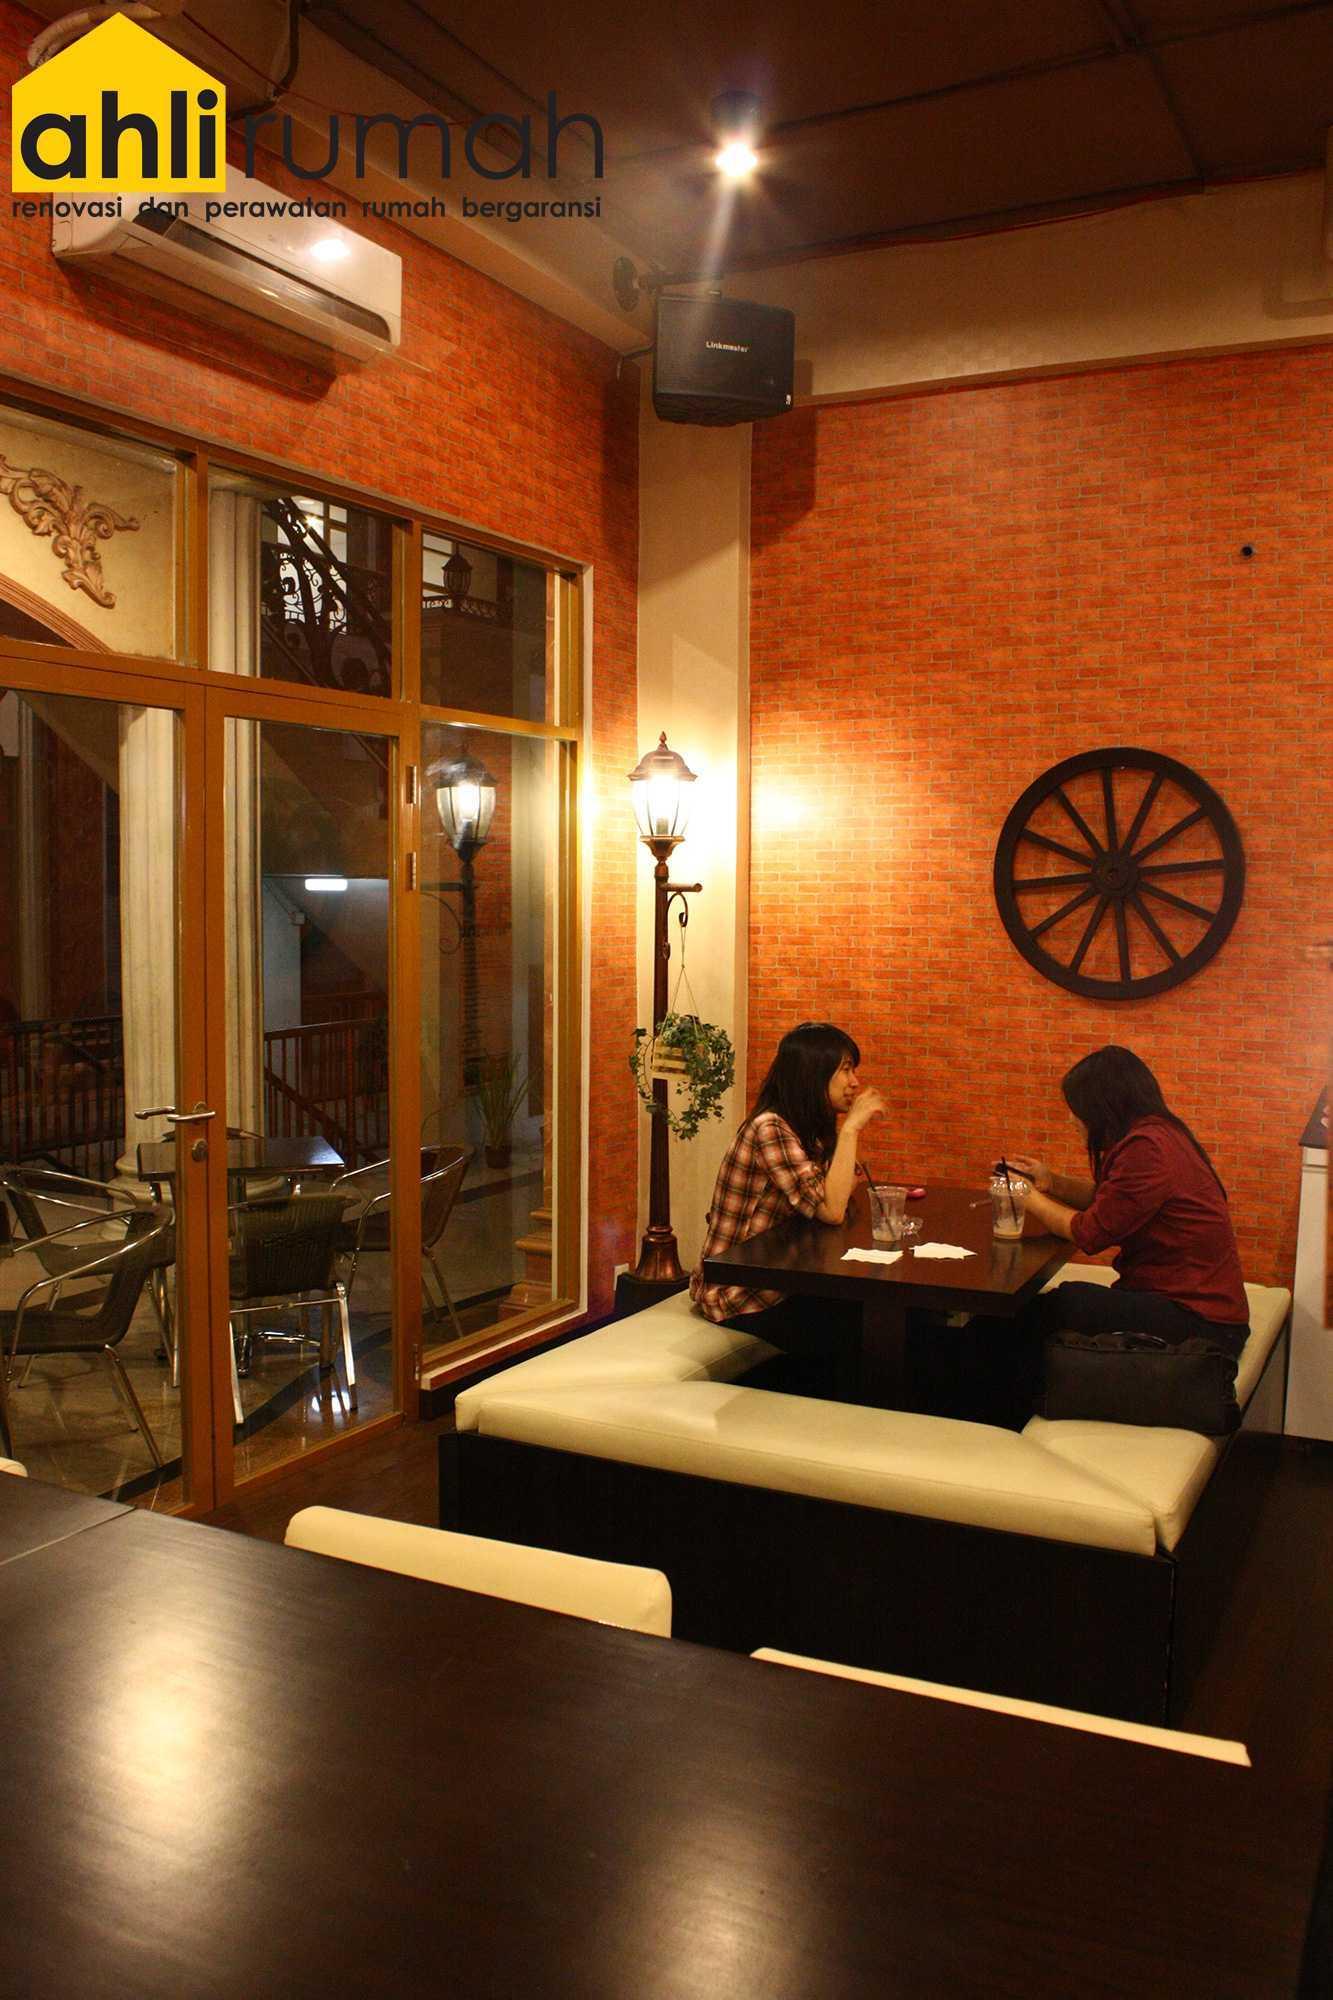 Ahlirumah.id Interior - G8 Shop Jakarta, Daerah Khusus Ibukota Jakarta, Indonesia  Seating Area Restaurant   49180